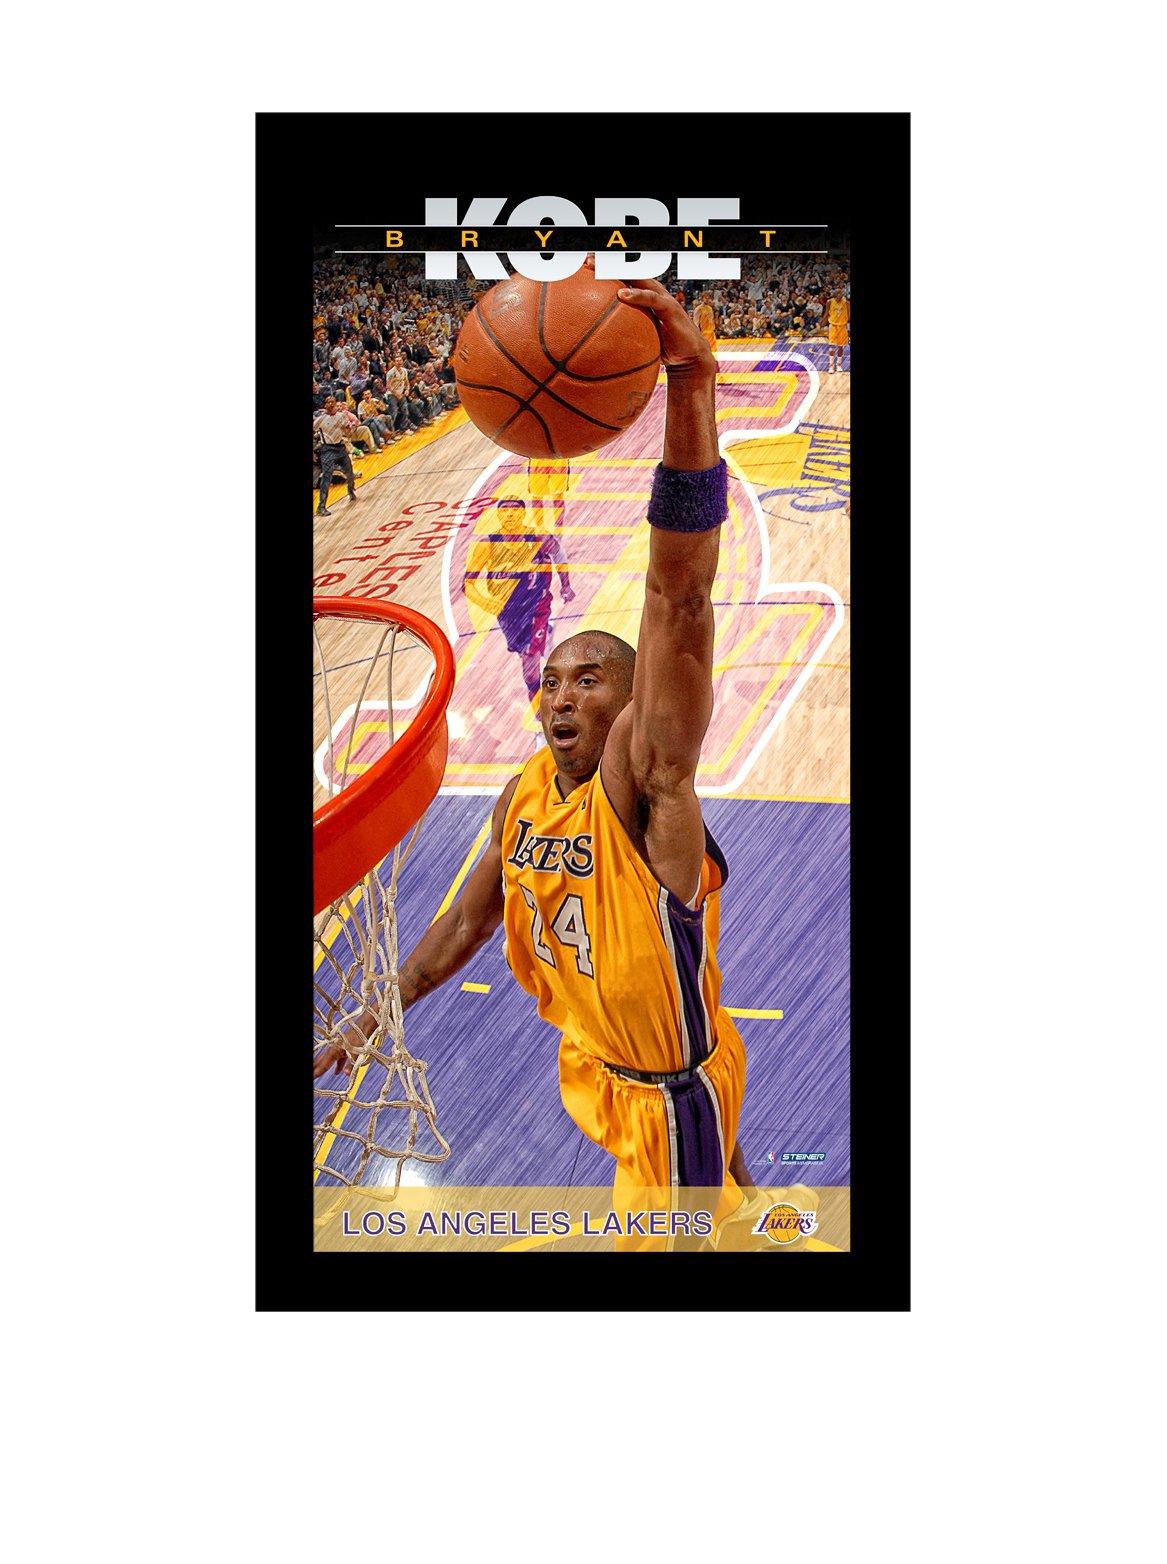 NBA Los Angeles Lakers Kobe Bryant Player Profile Wall Art 9.5x19 Framed Photo